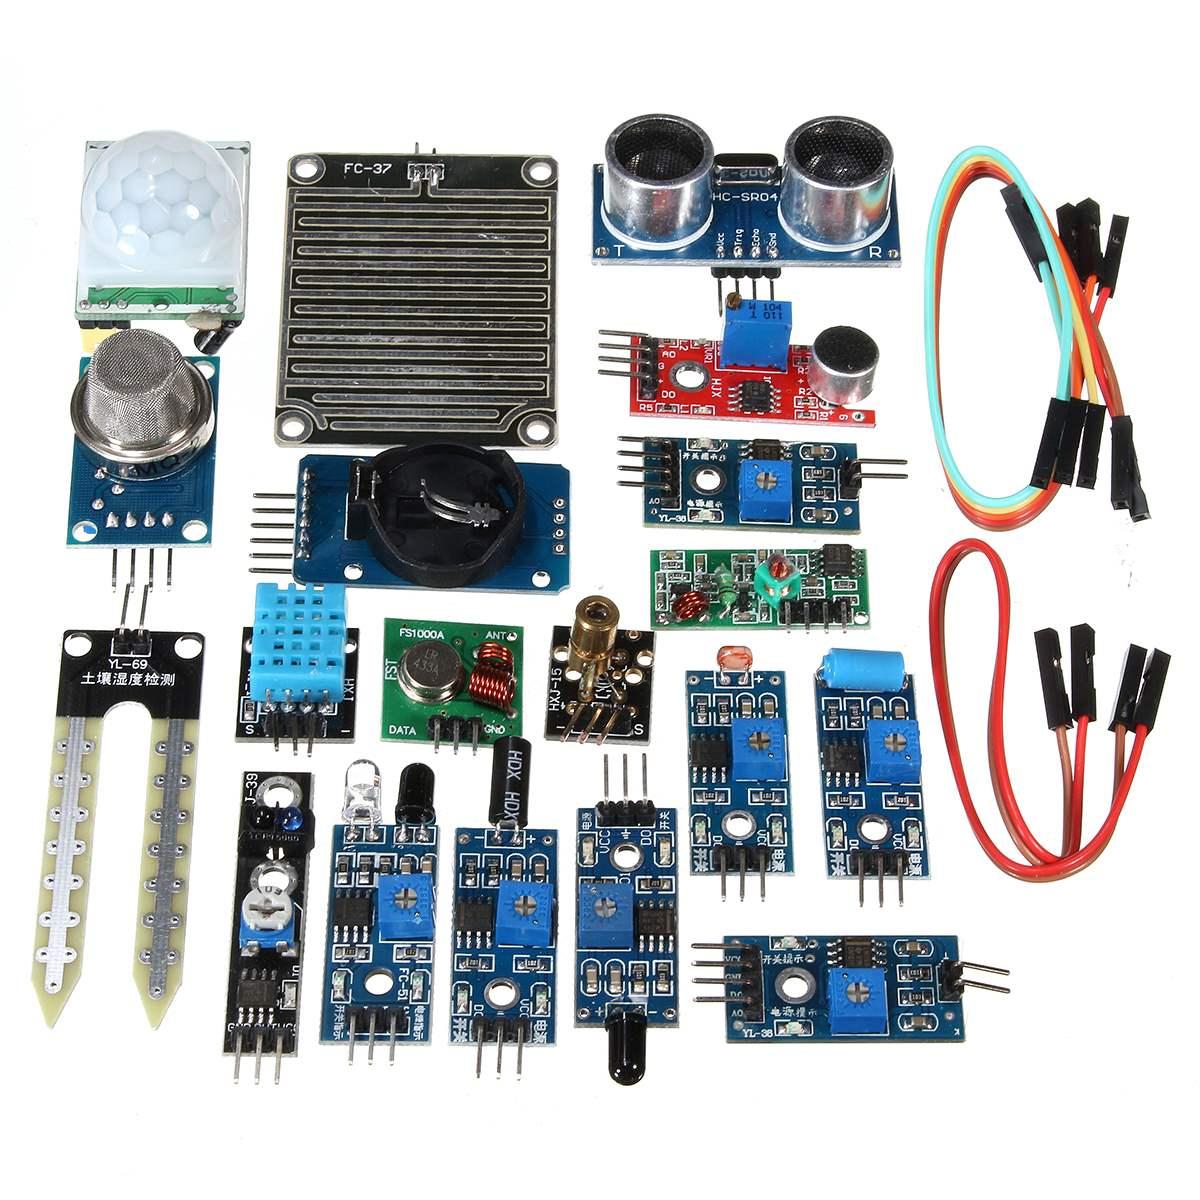 New Arrival 16PCS/Set For Raspberry Pi 3 2 Zero W Sensor Kit Module Kits Ultrasonic Photoresisto for Home Automation